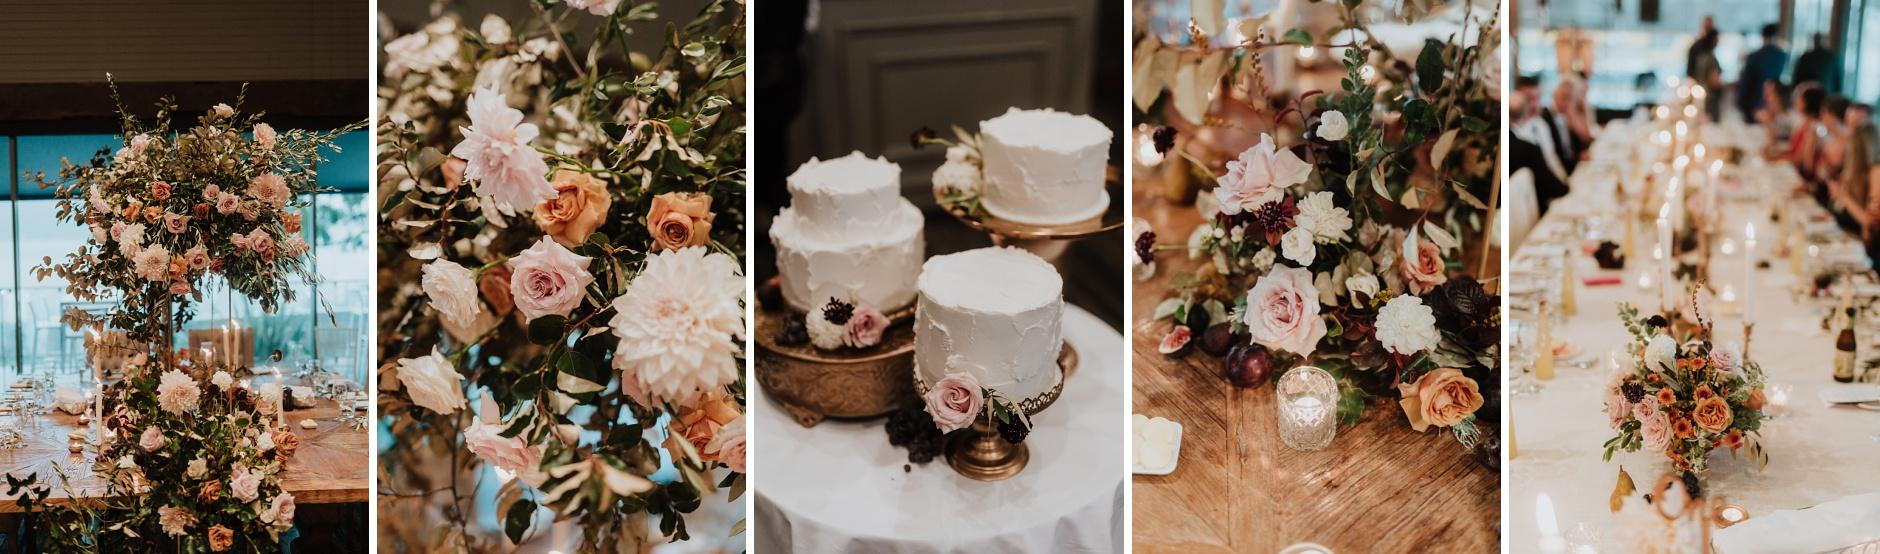 Sydney-Wedding-Photographer_0146.jpg